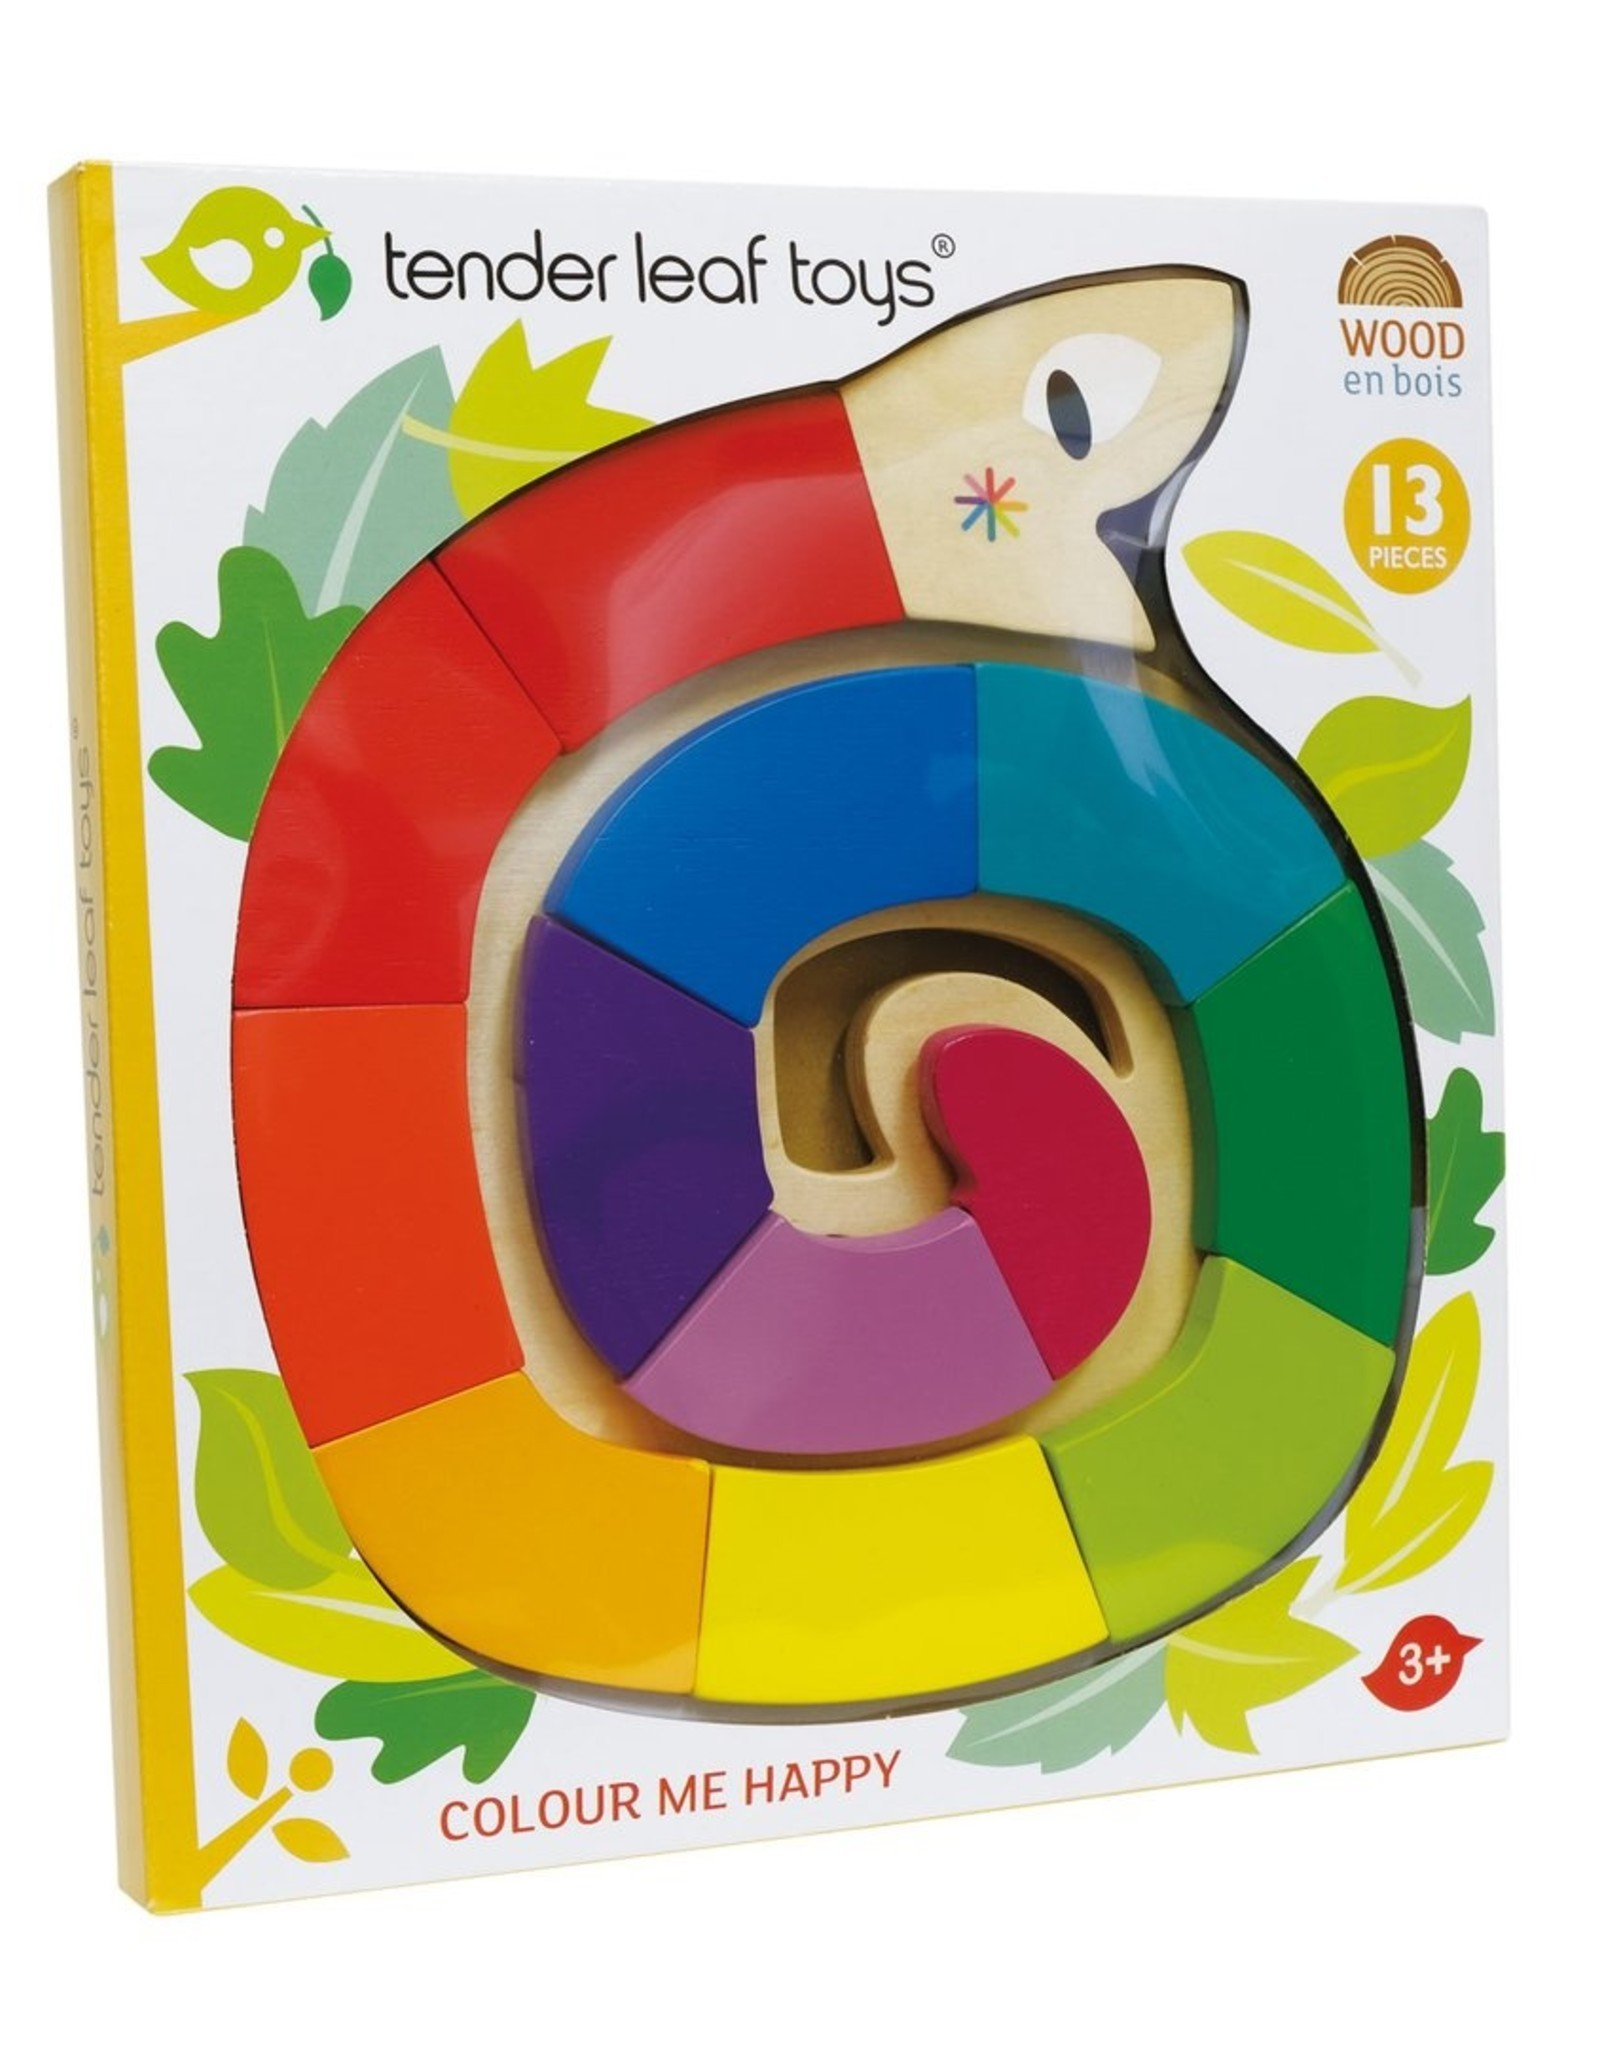 Tender leaf toys Colour Me Happy